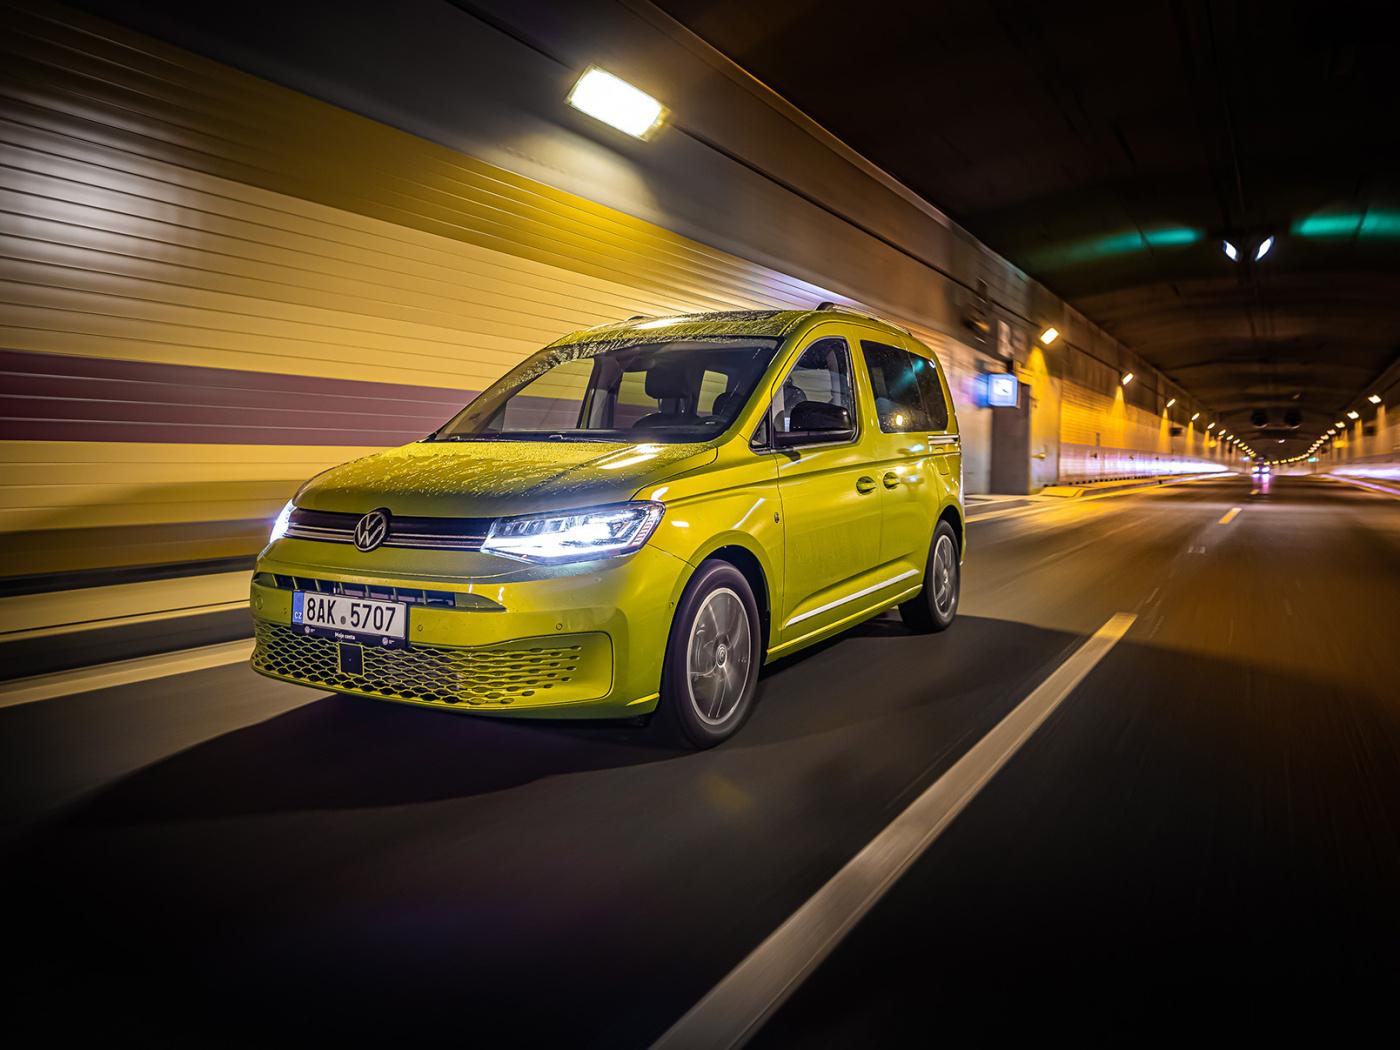 Volkswagen Caddy 5 vstupuje na český trh s akčními cenami